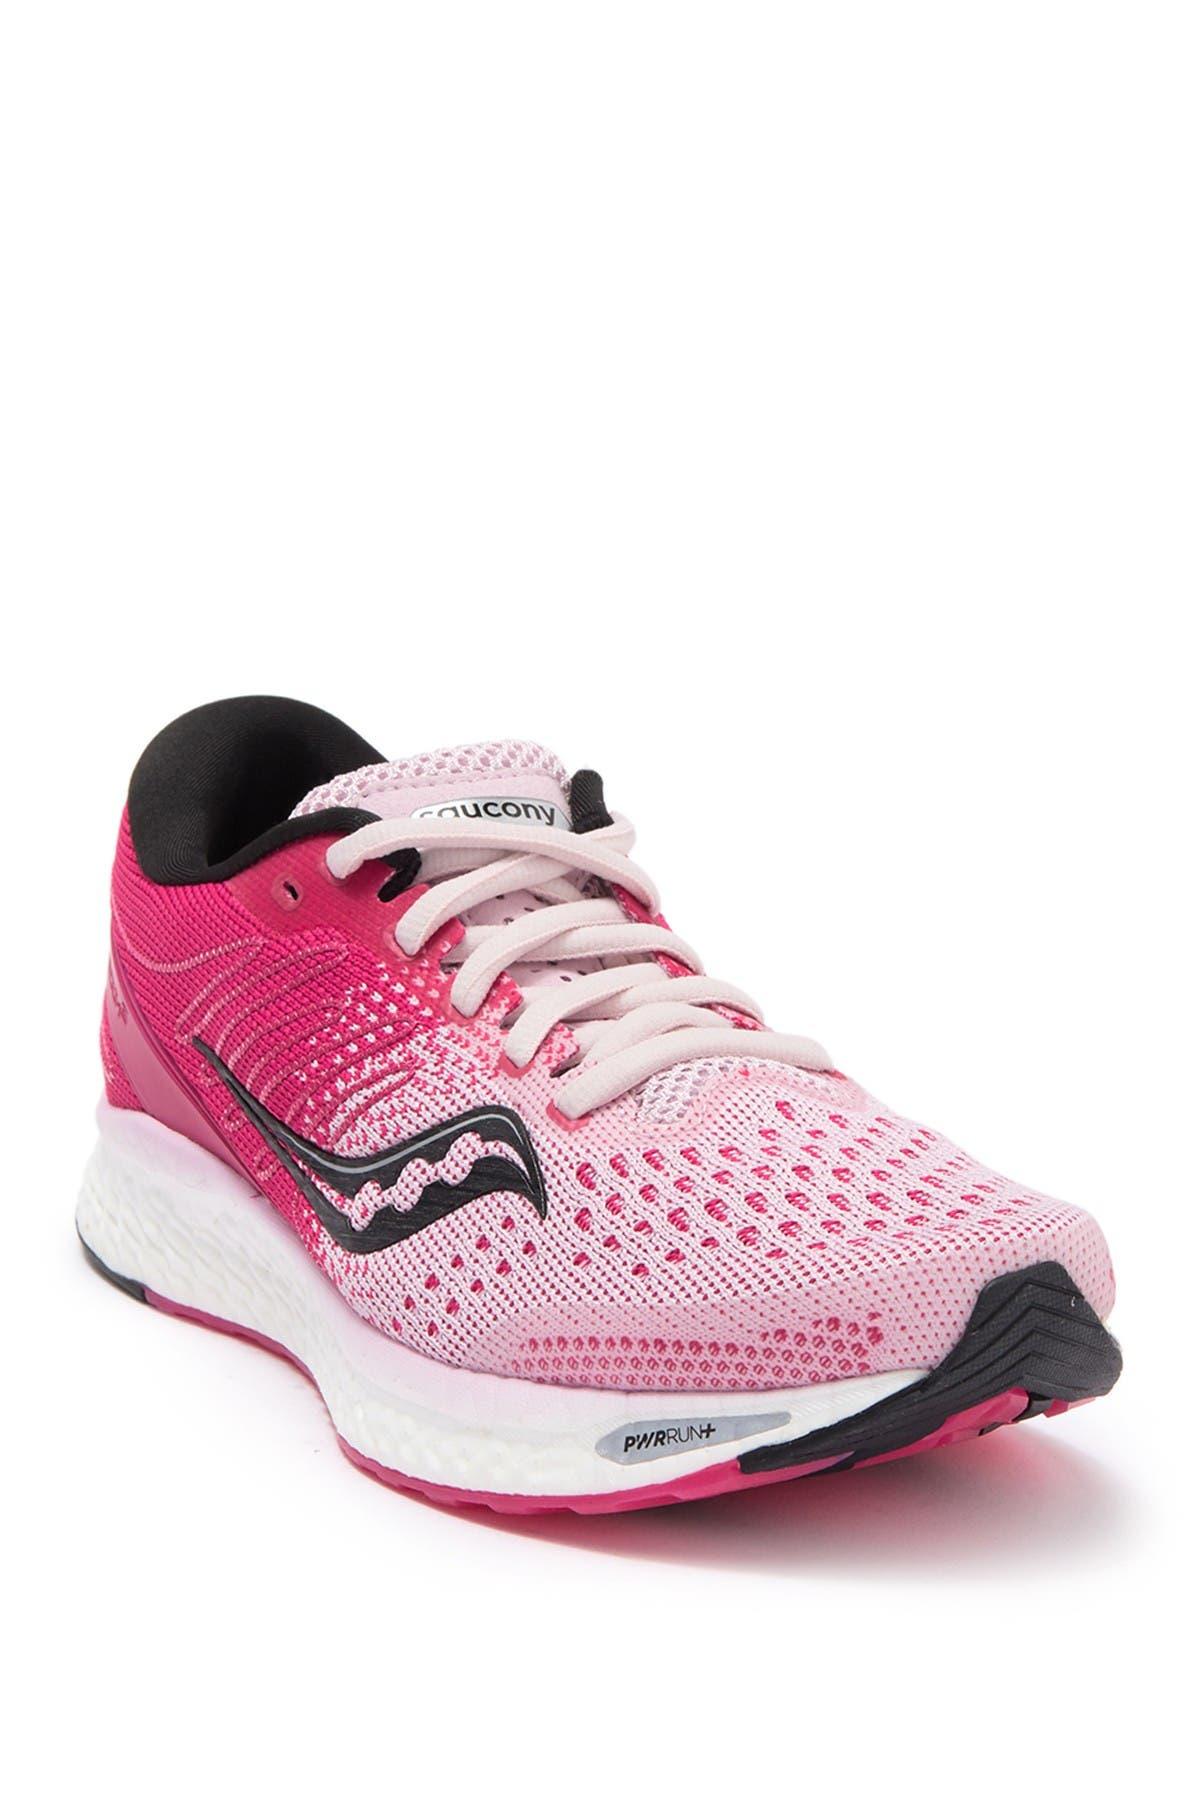 Image of Saucony Freedom 3 Running Sneaker